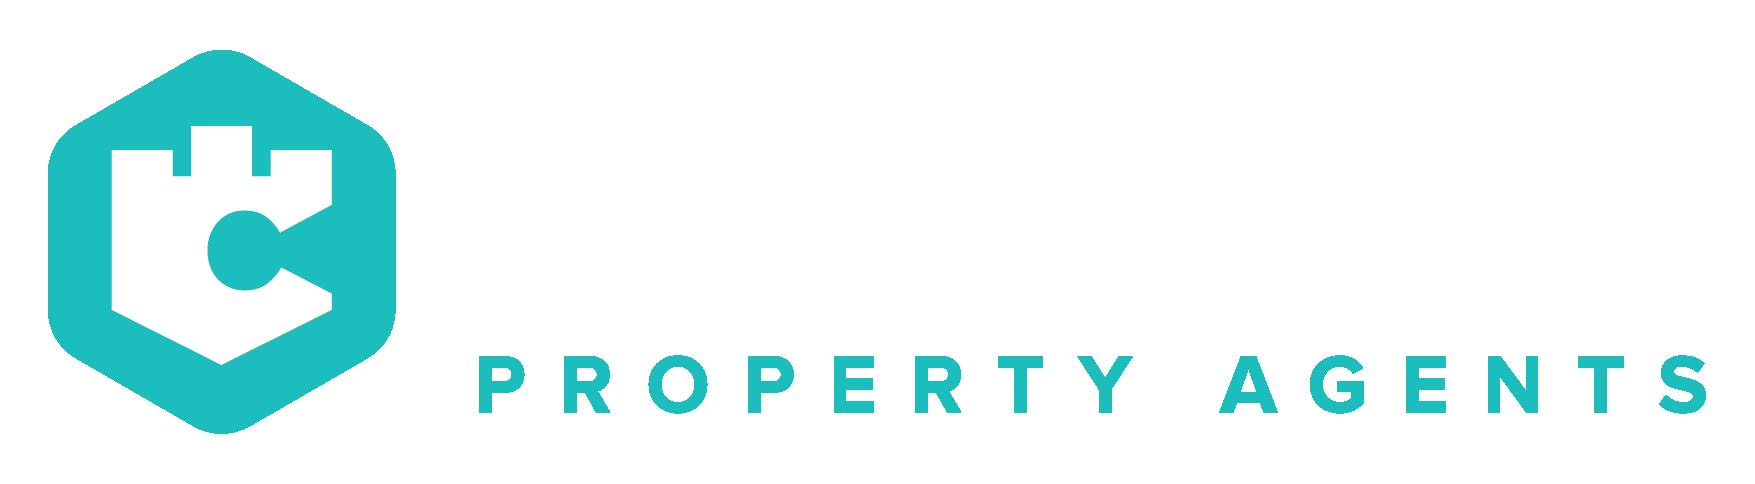 Castle Property Agents -